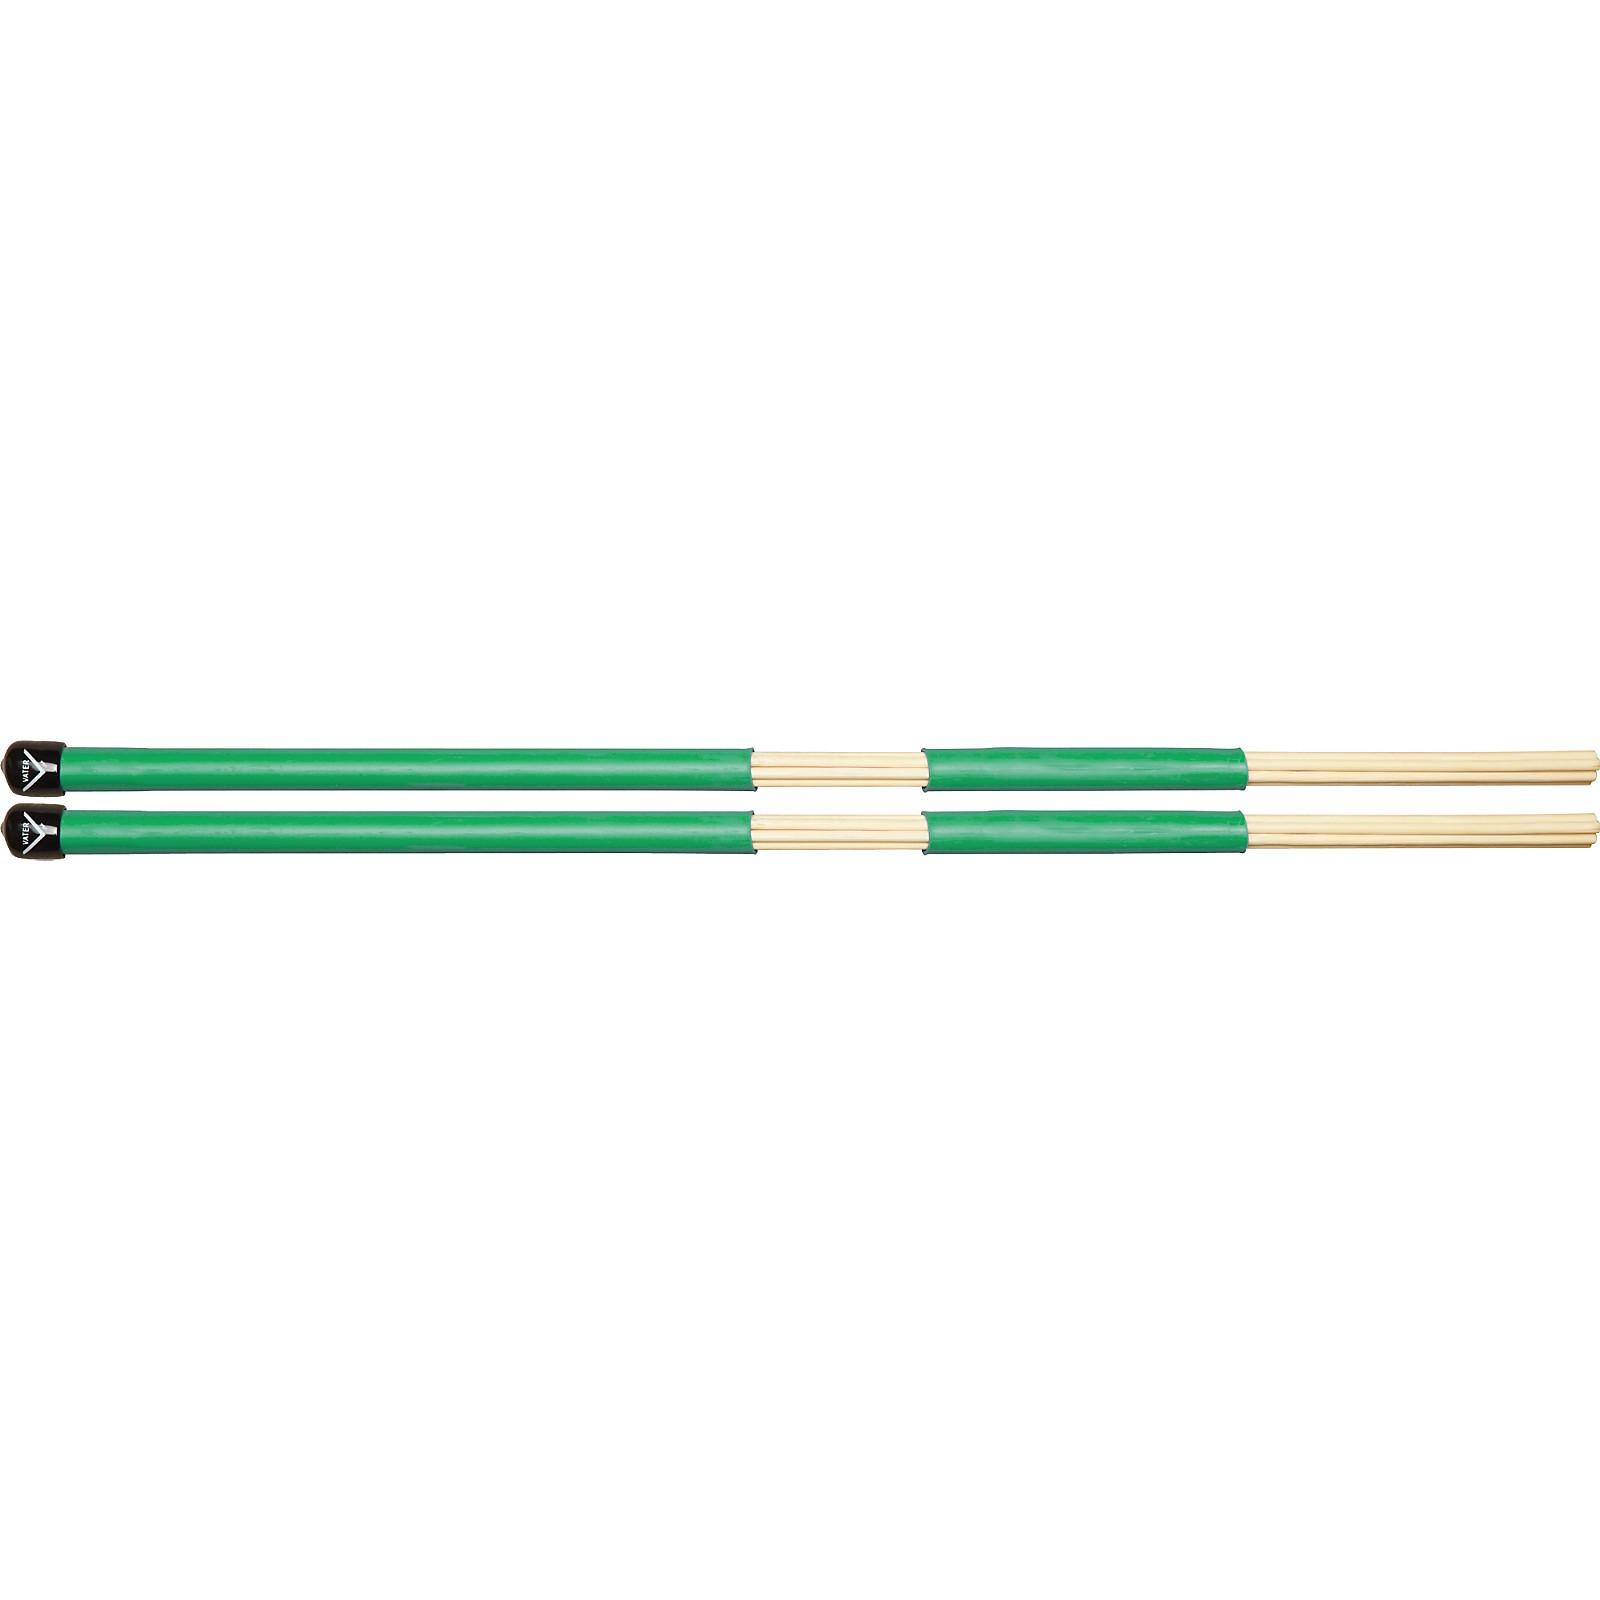 Vater Bamboo Splashstick Slim